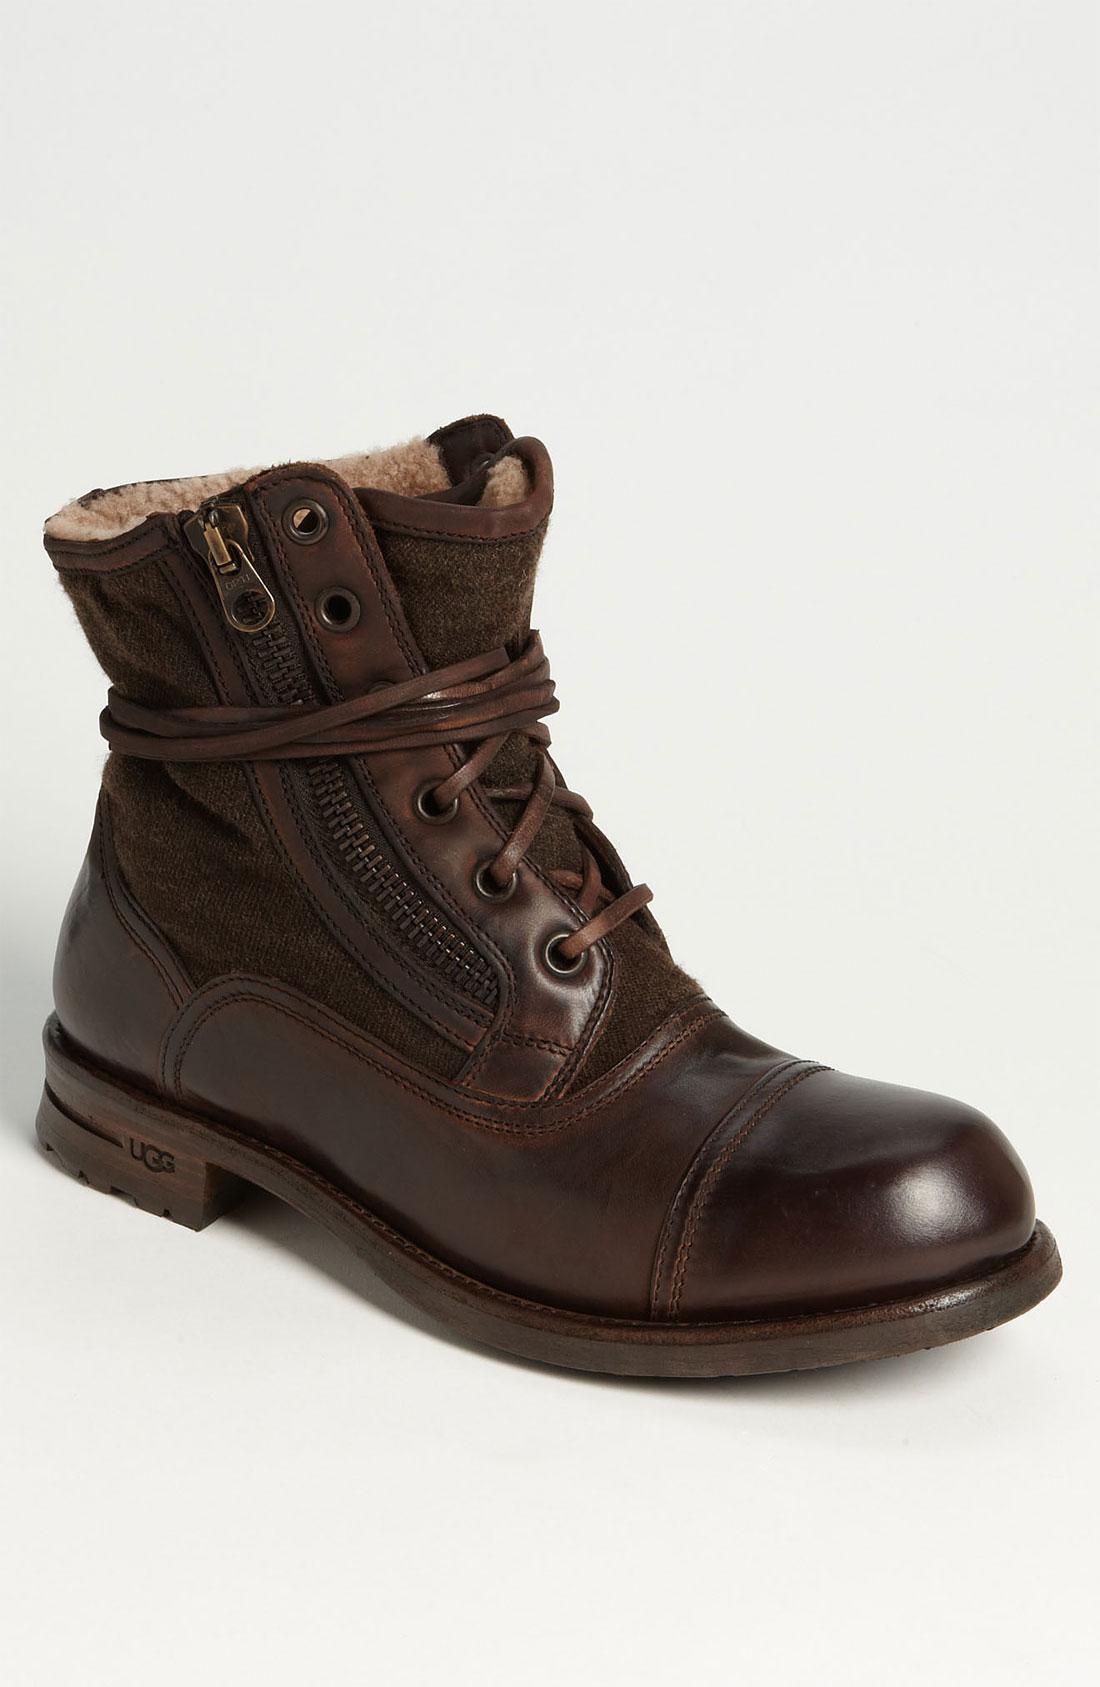 8e918bbd098 Mens Brown Ugg Boots - Ivoiregion